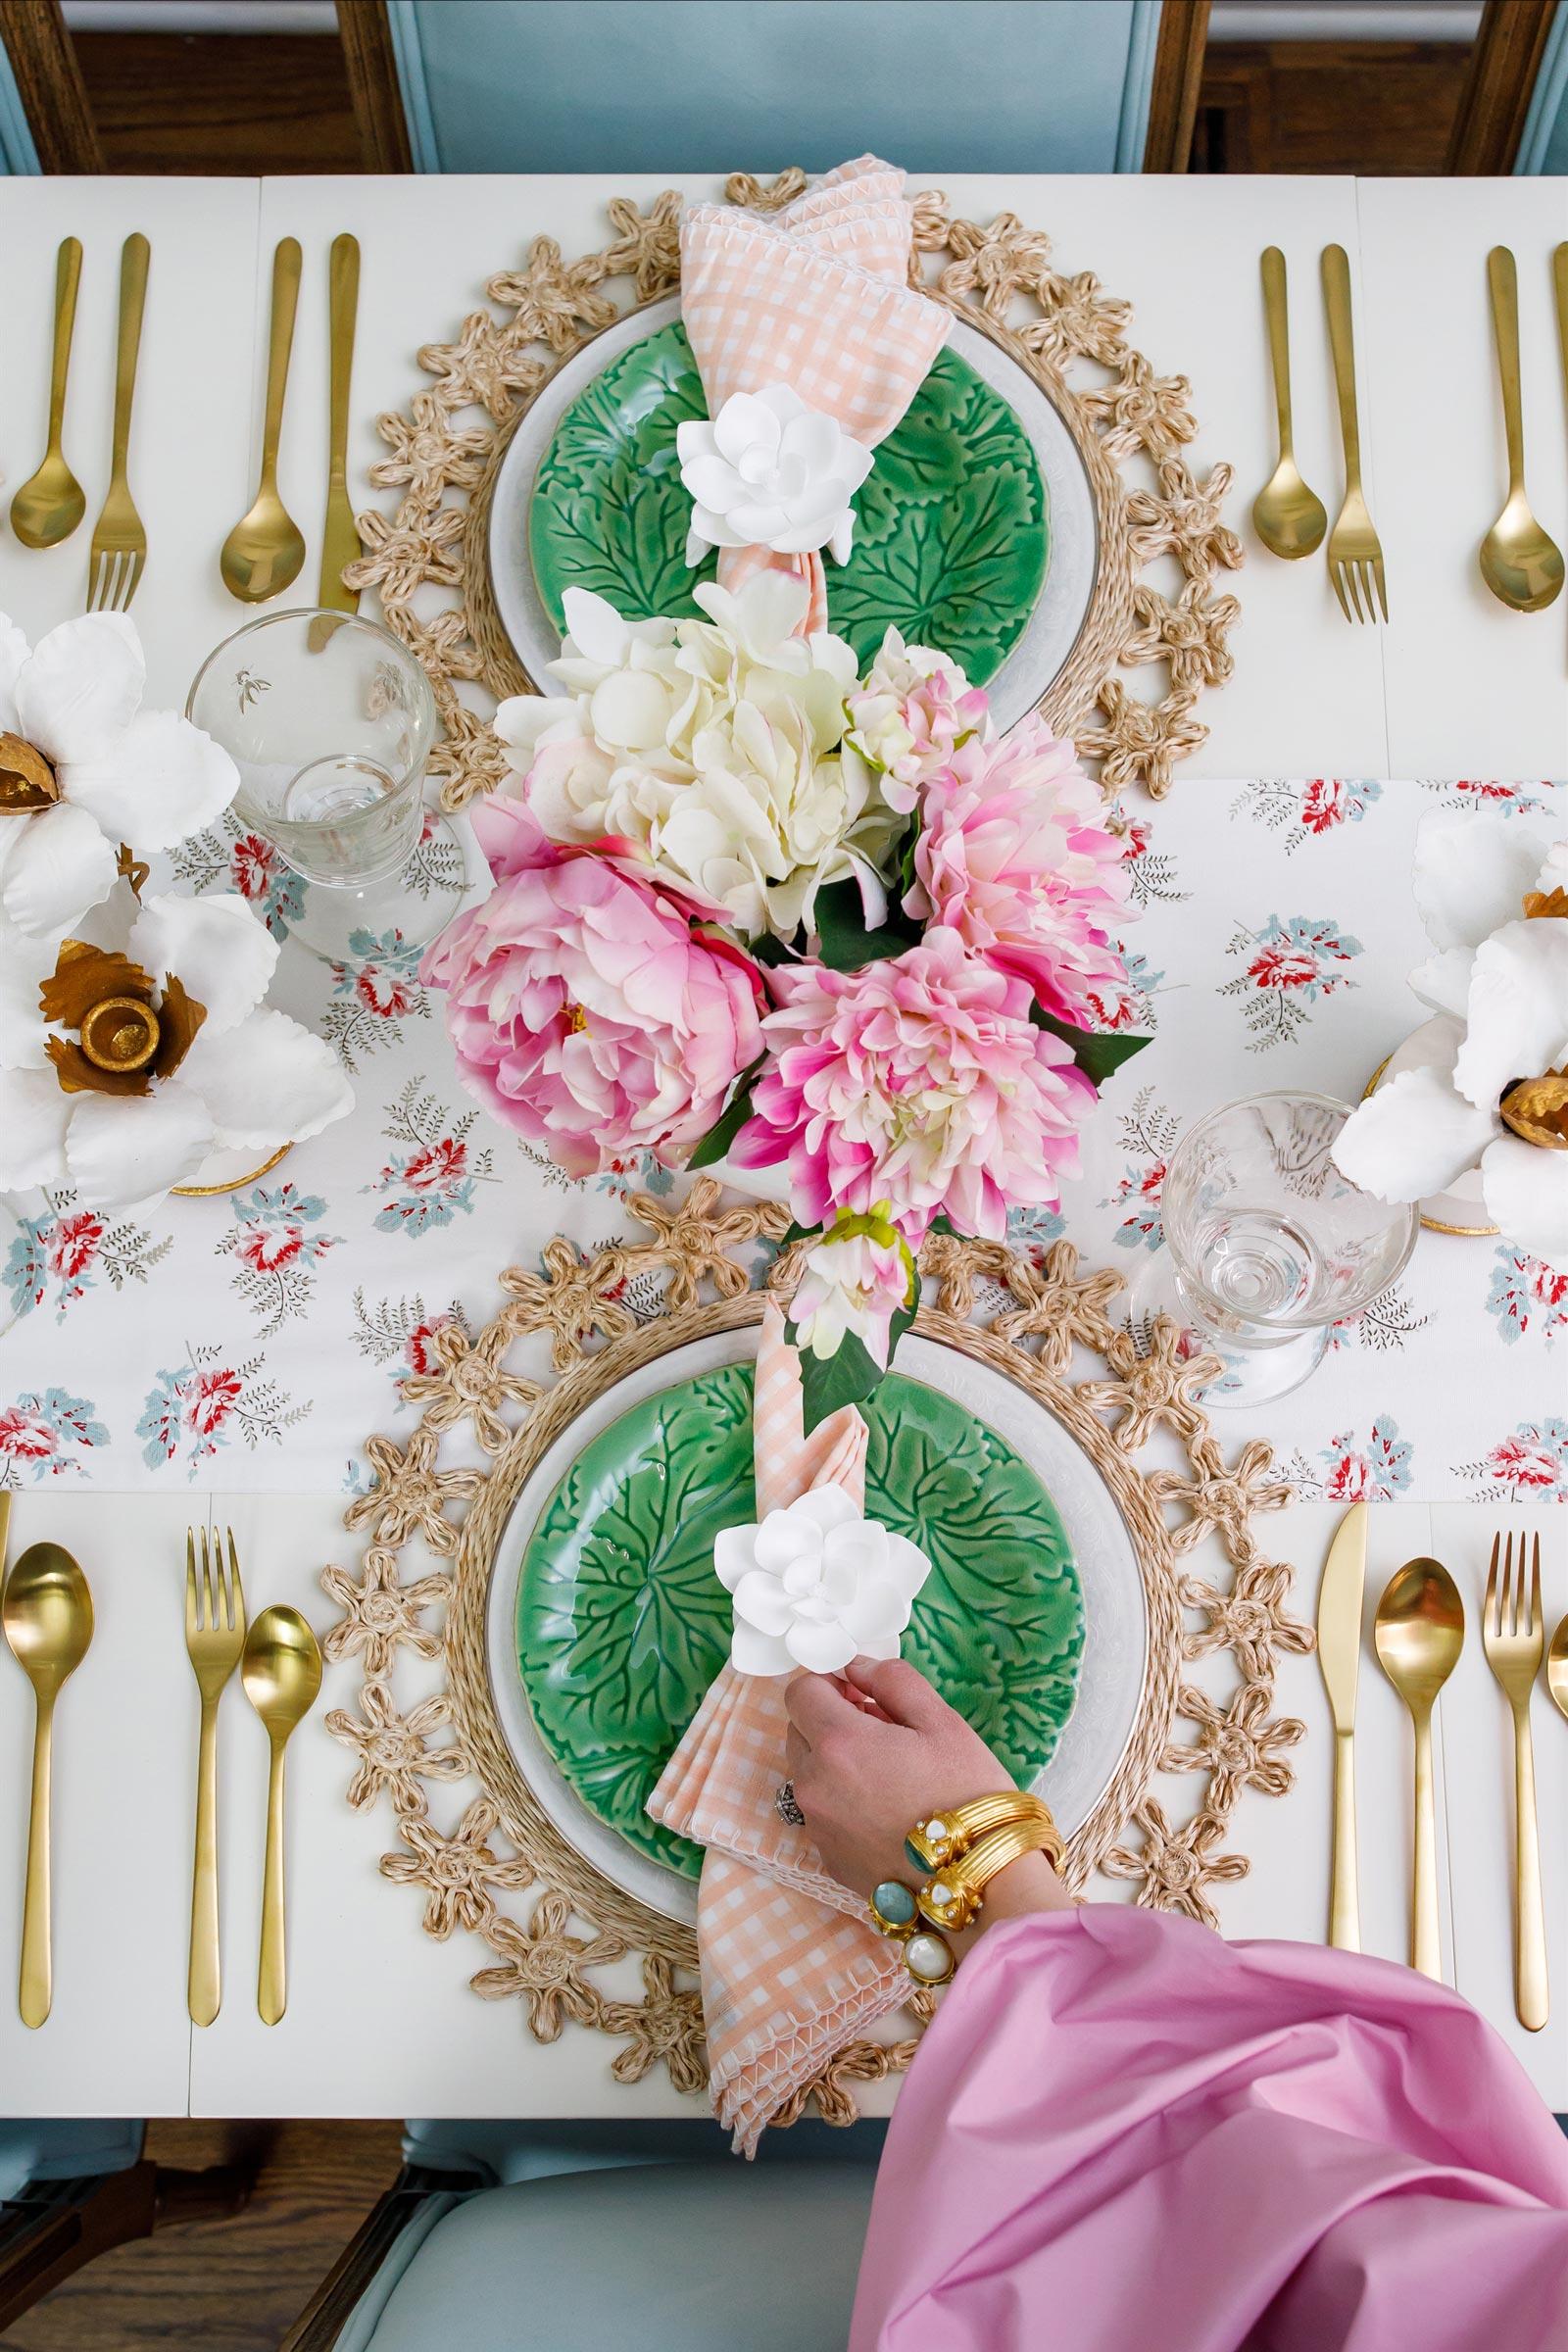 Jennifer Lake Ballard Designs Colorful Tablescape